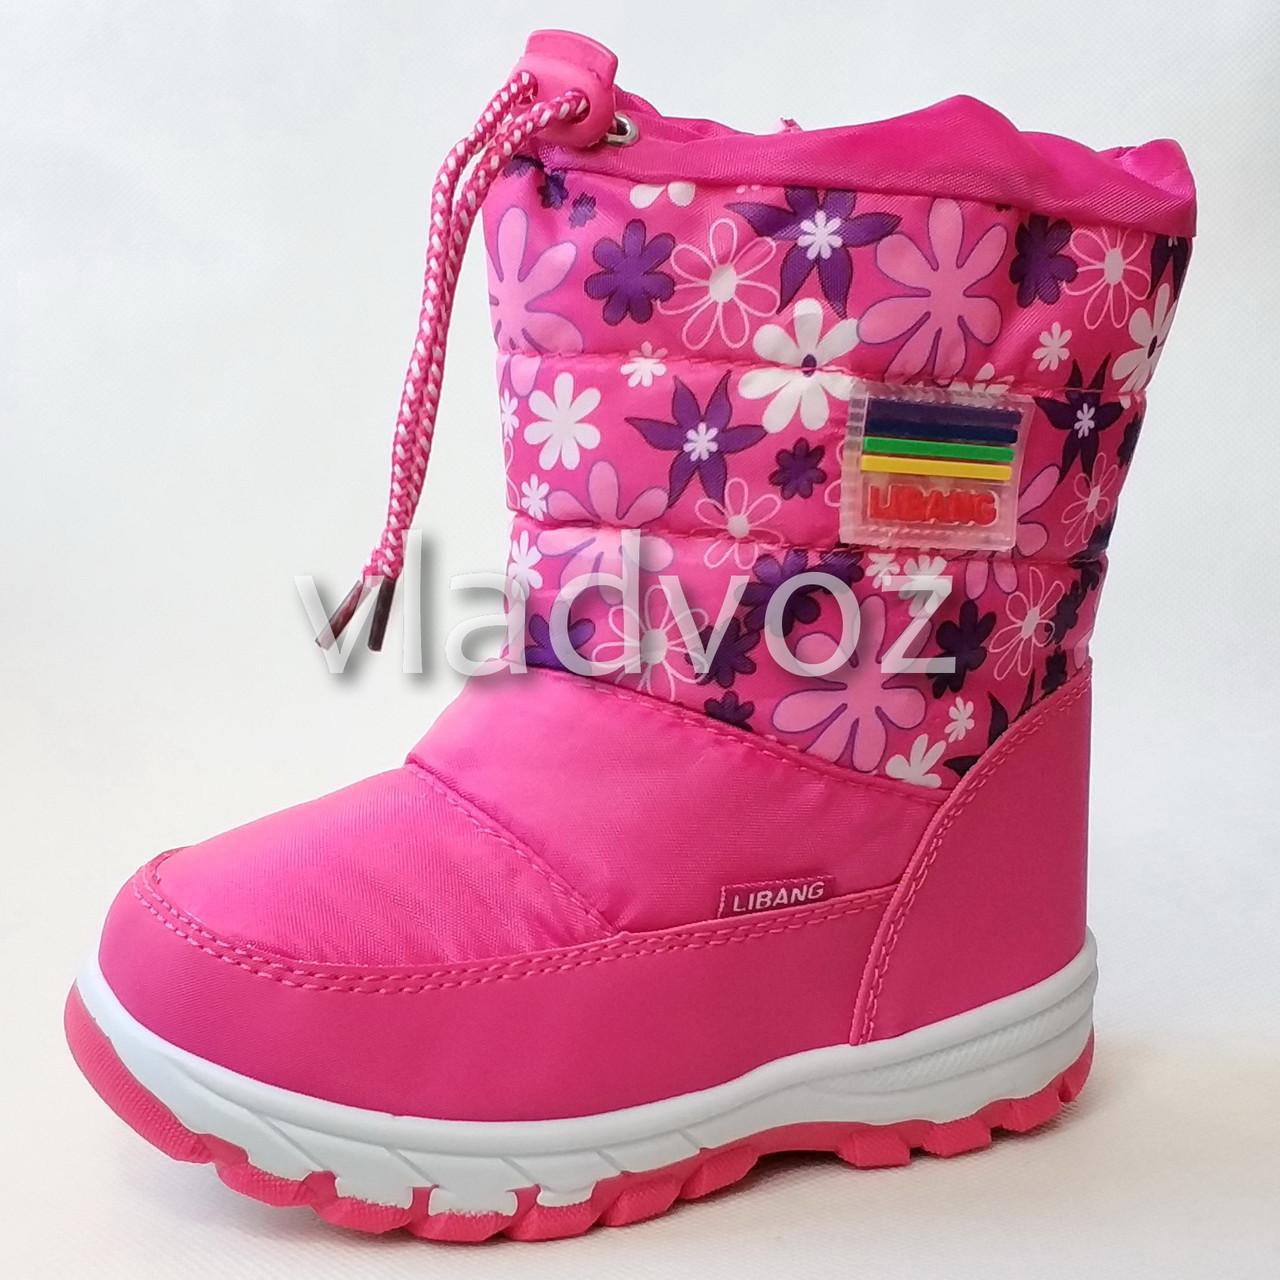 443d3cfd2 Детские дутики зимние сапоги на зиму для девочки розовые Libang 29. - ☎  VIBER 0977864700